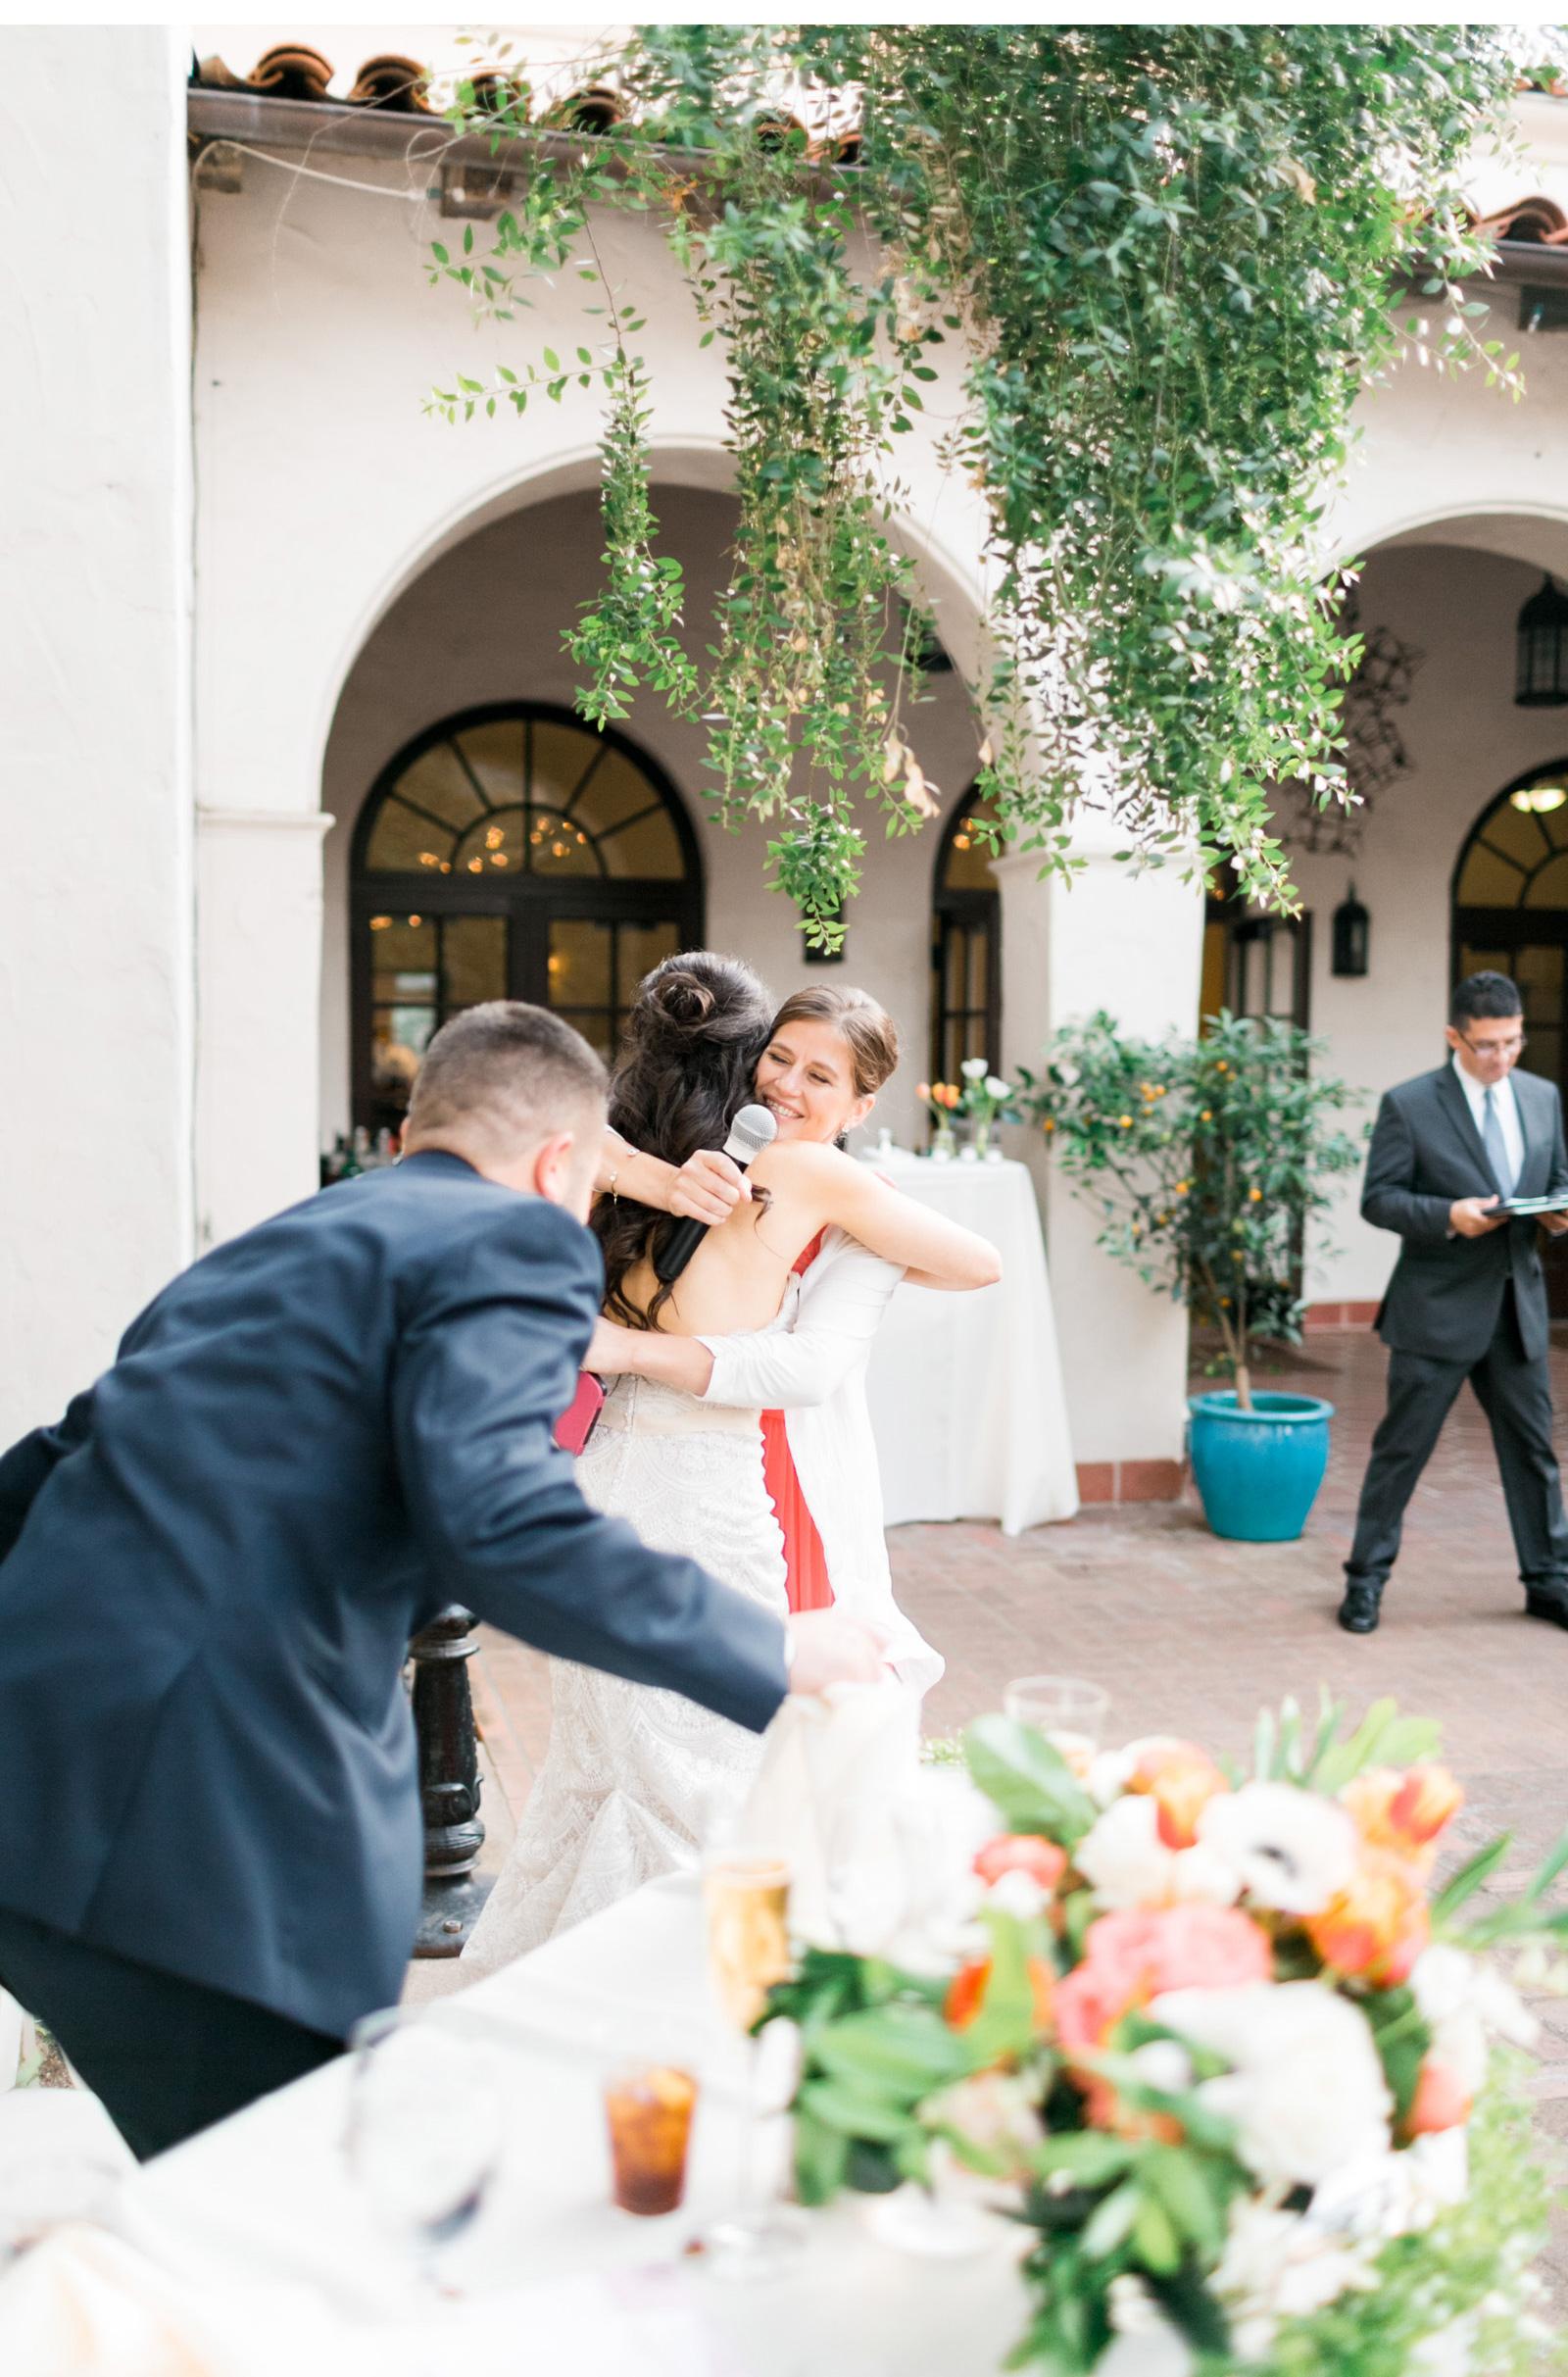 Style-Me-Pretty-Santa-Barbara-Wedding-Natalie-Schutt-Photography_10.jpg